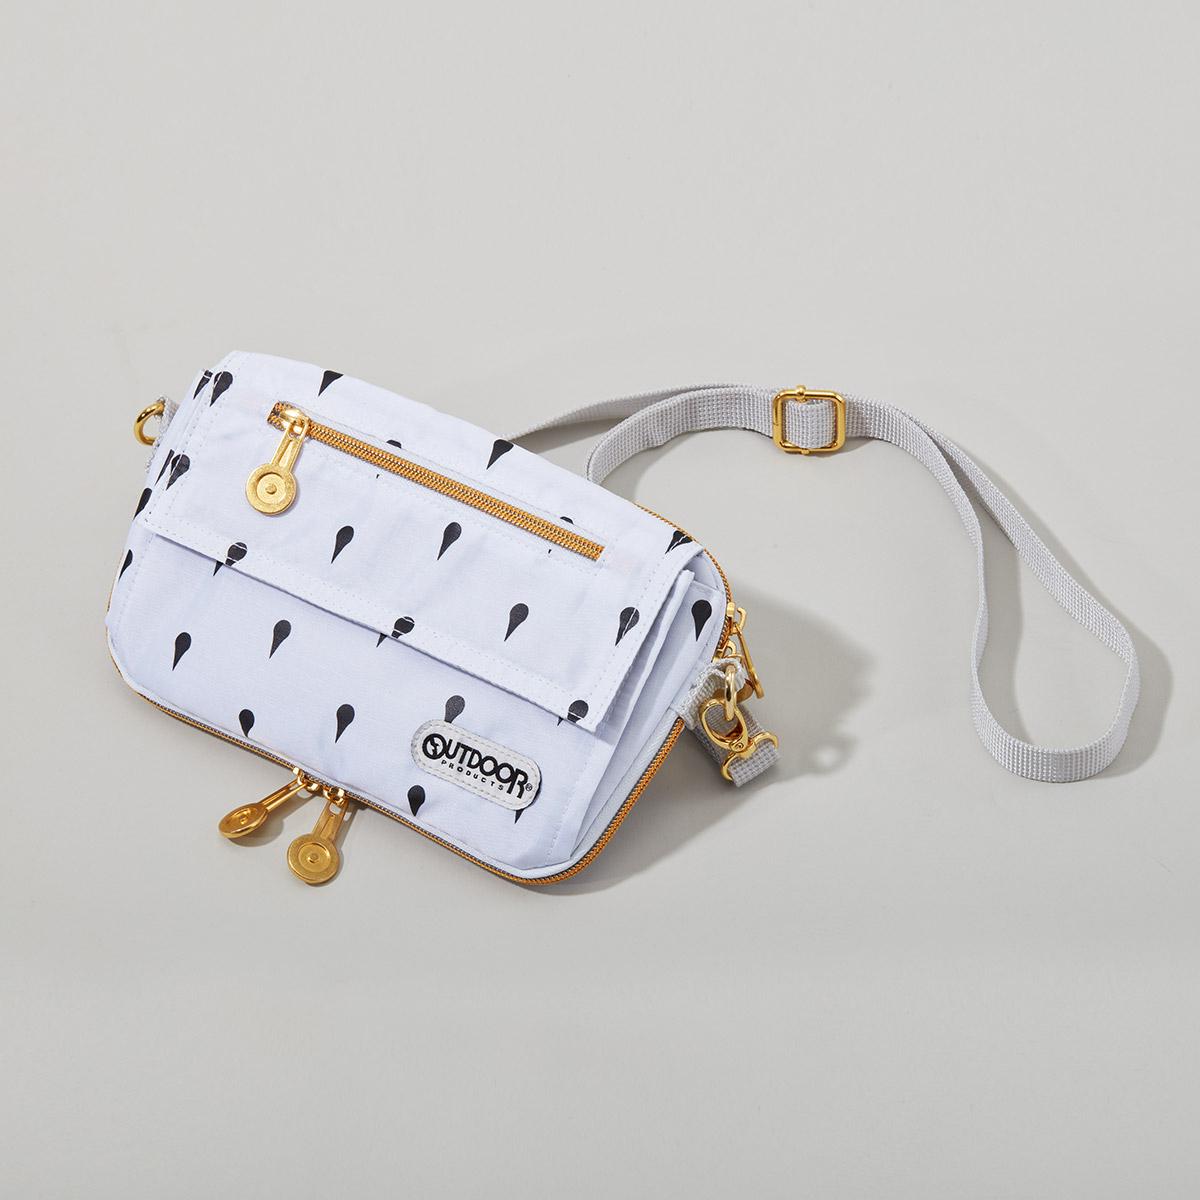 [NEW] JOJO OUTDOOR Bucciarati Shoulder Bag Premium Bandai Limited, Jojo's Bizarre Adventure Part 5, Vento Aureo, Golden Wind